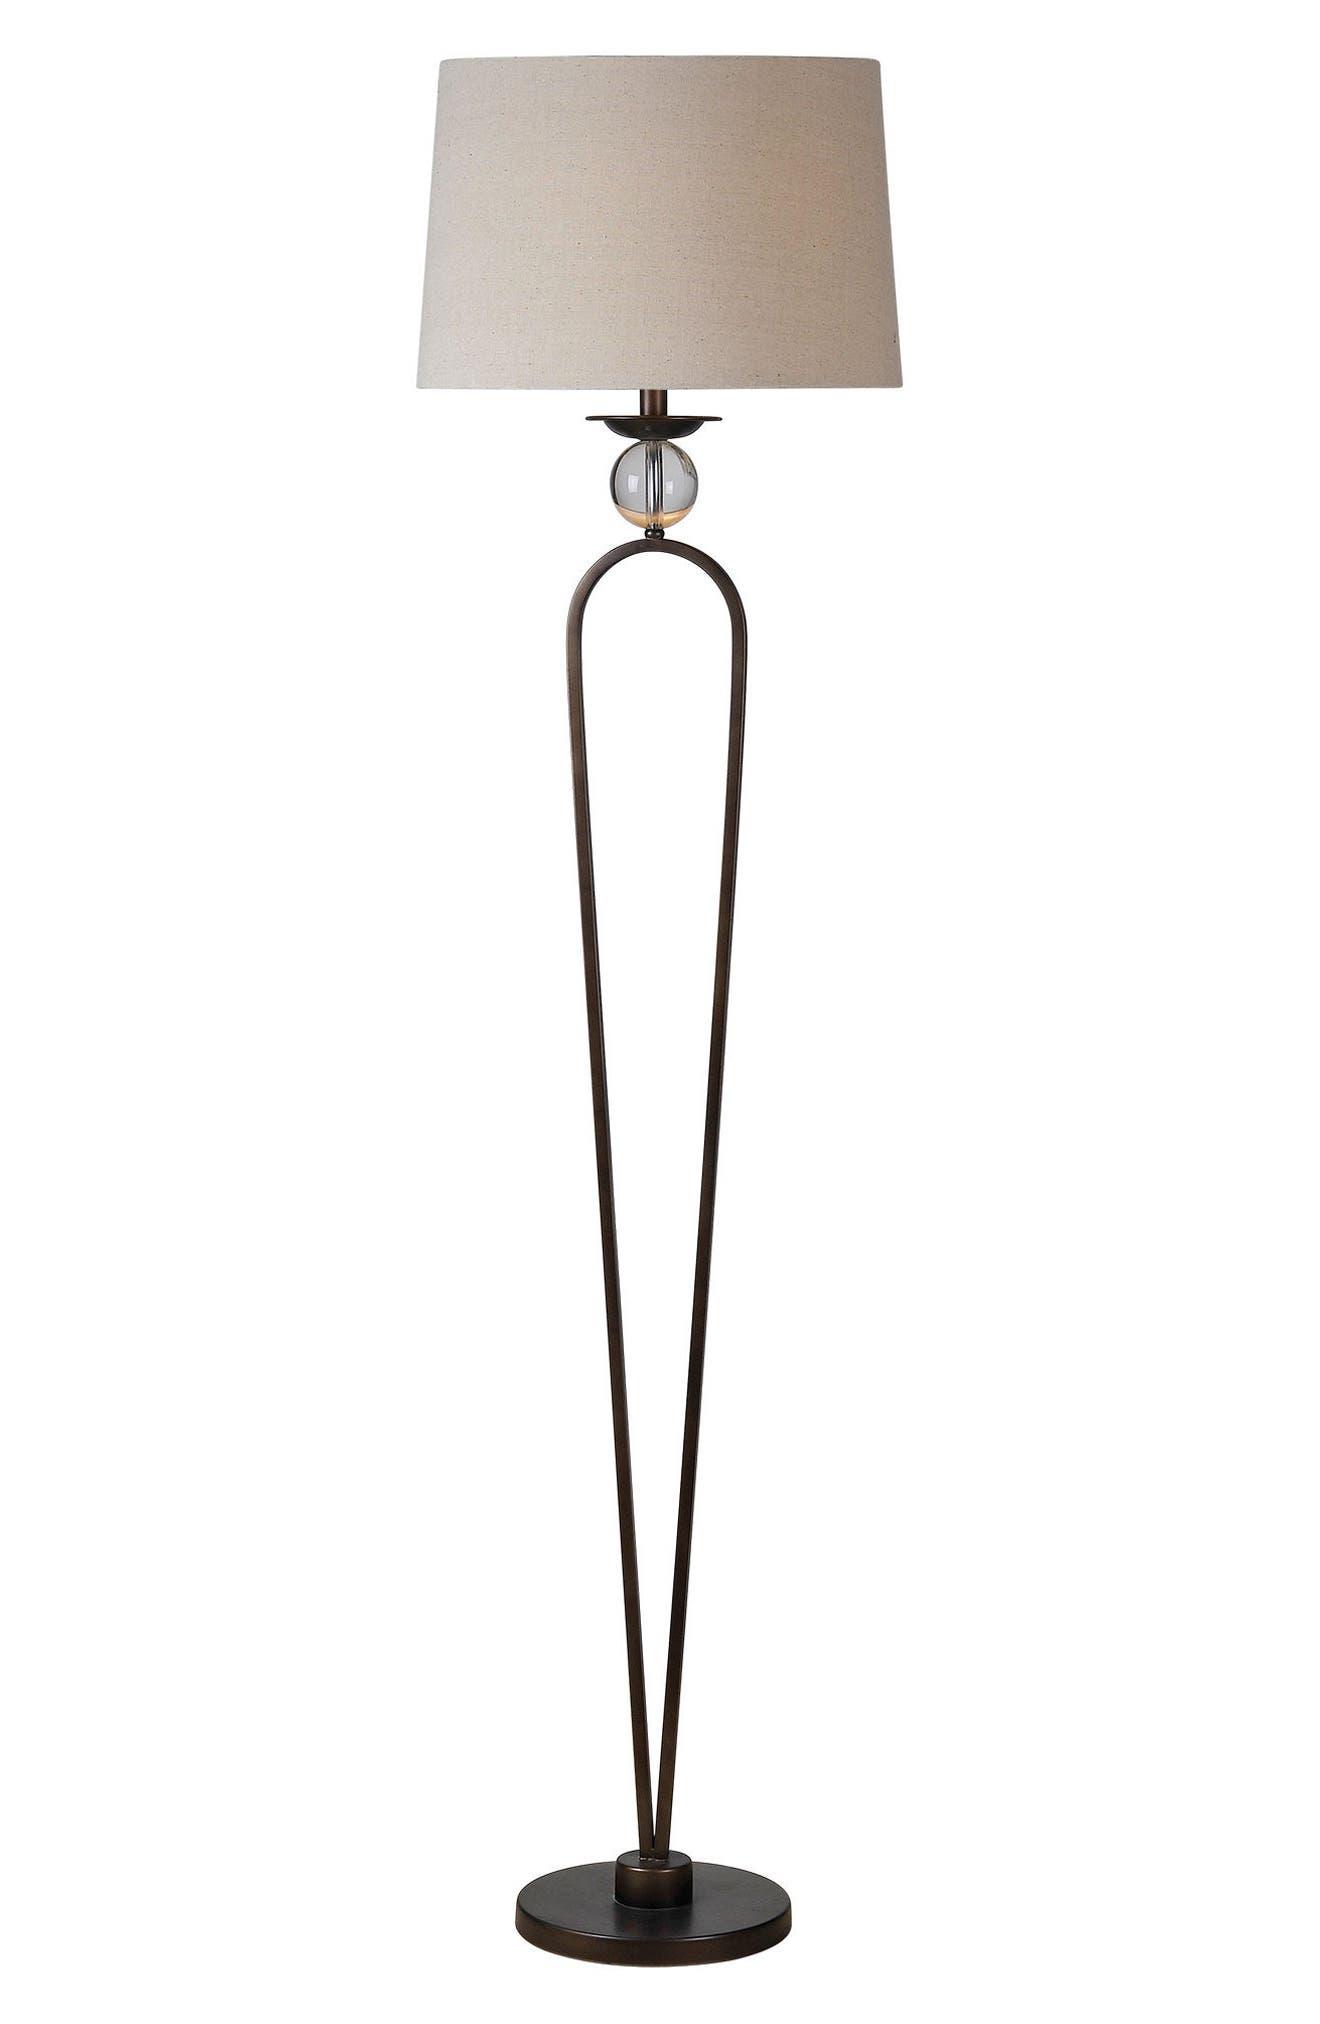 Pembroke Floor Lamp,                             Main thumbnail 1, color,                             220